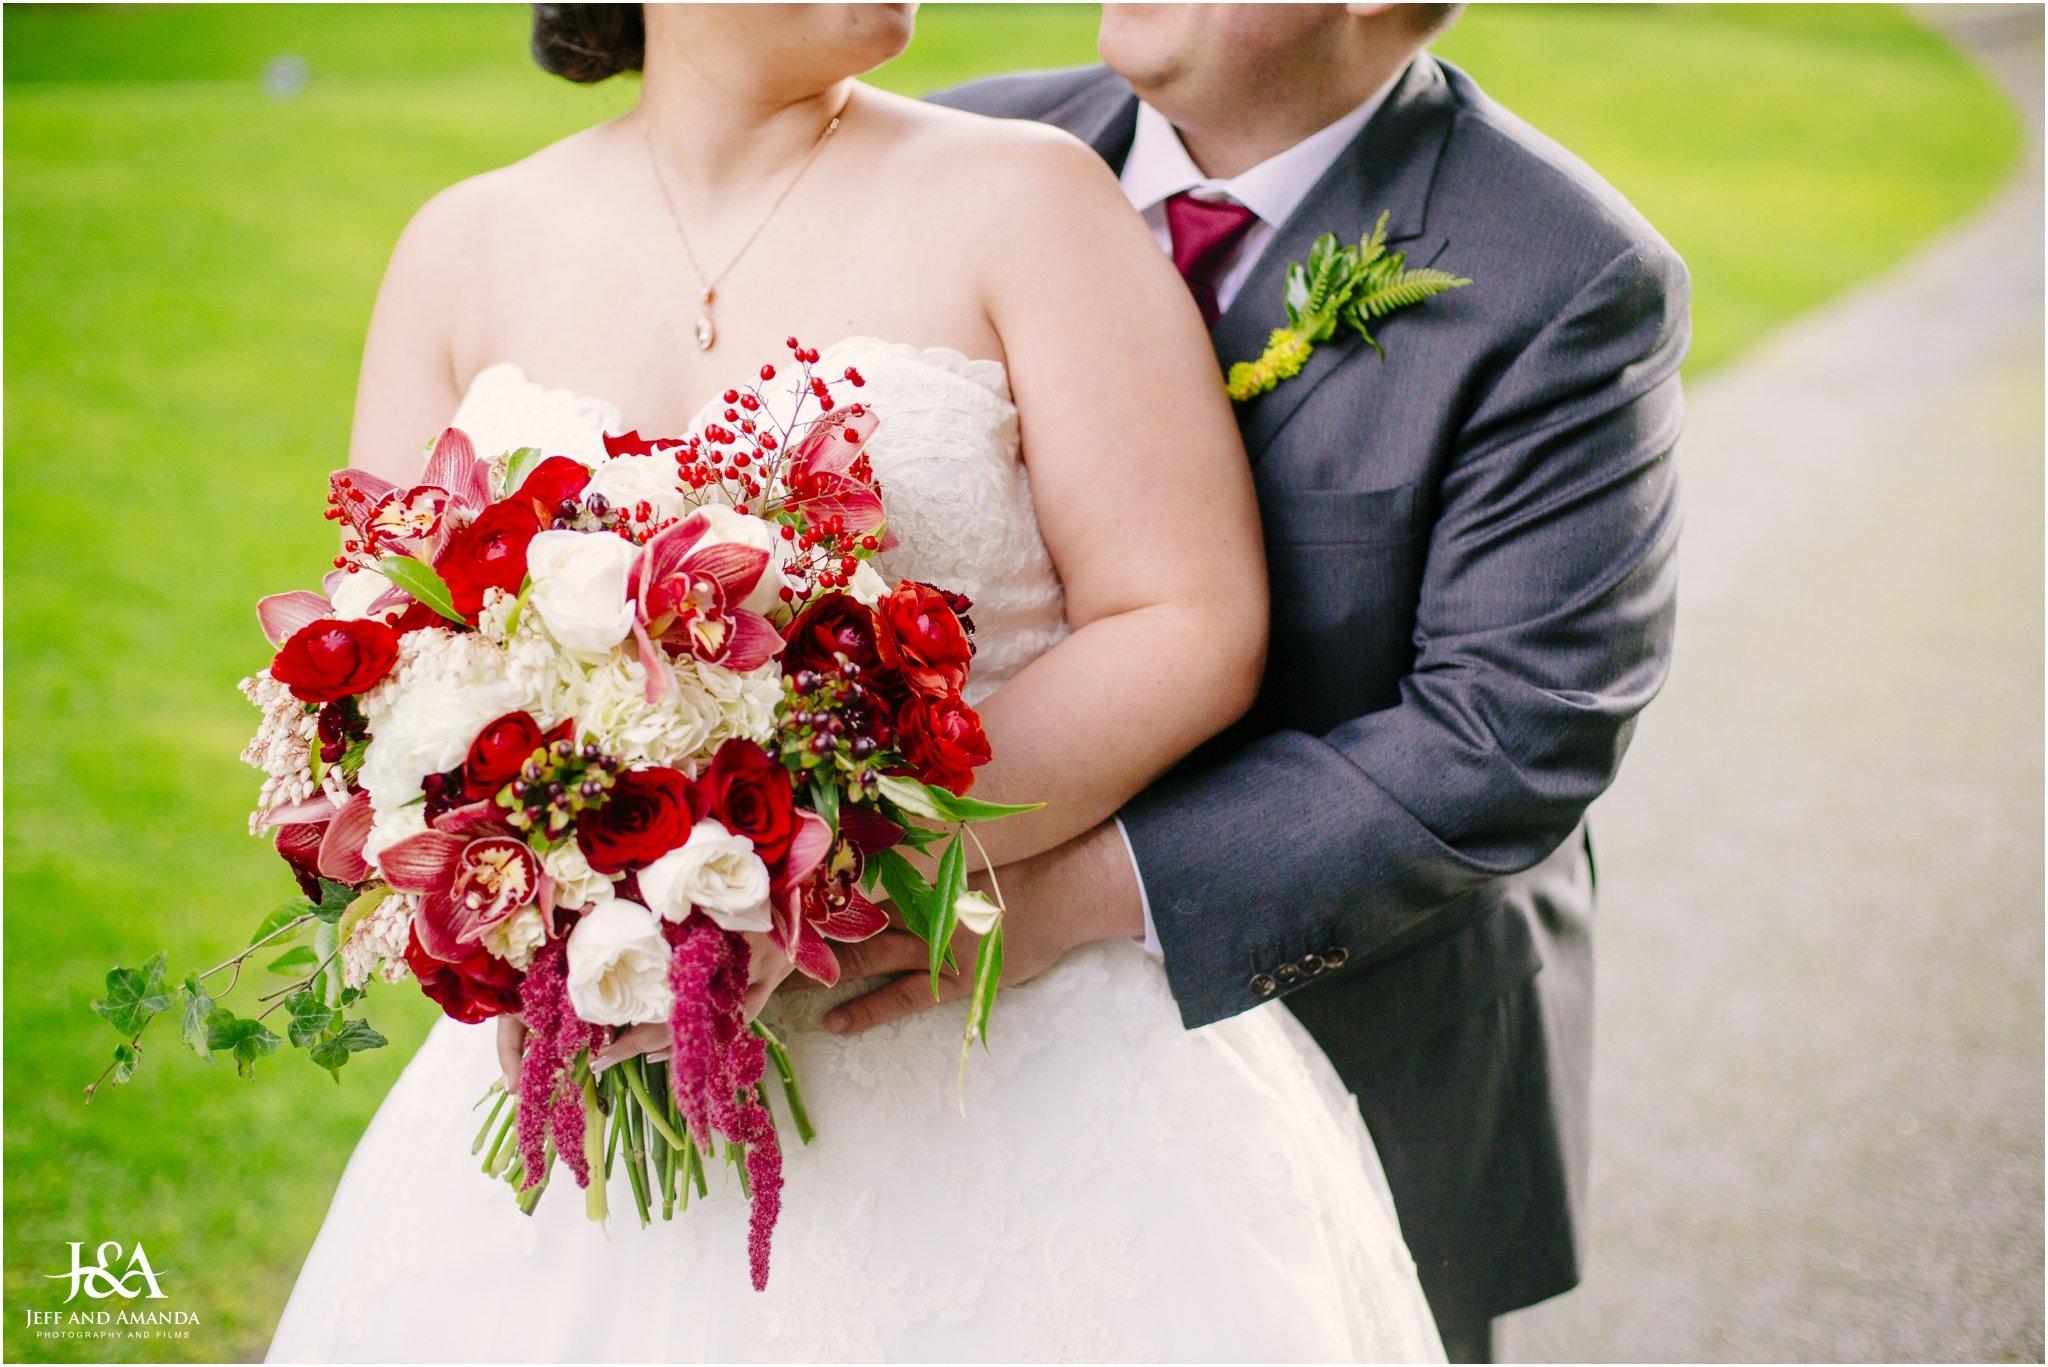 Dave and Kari s Wedding-Facebook Ready-0183.jpg